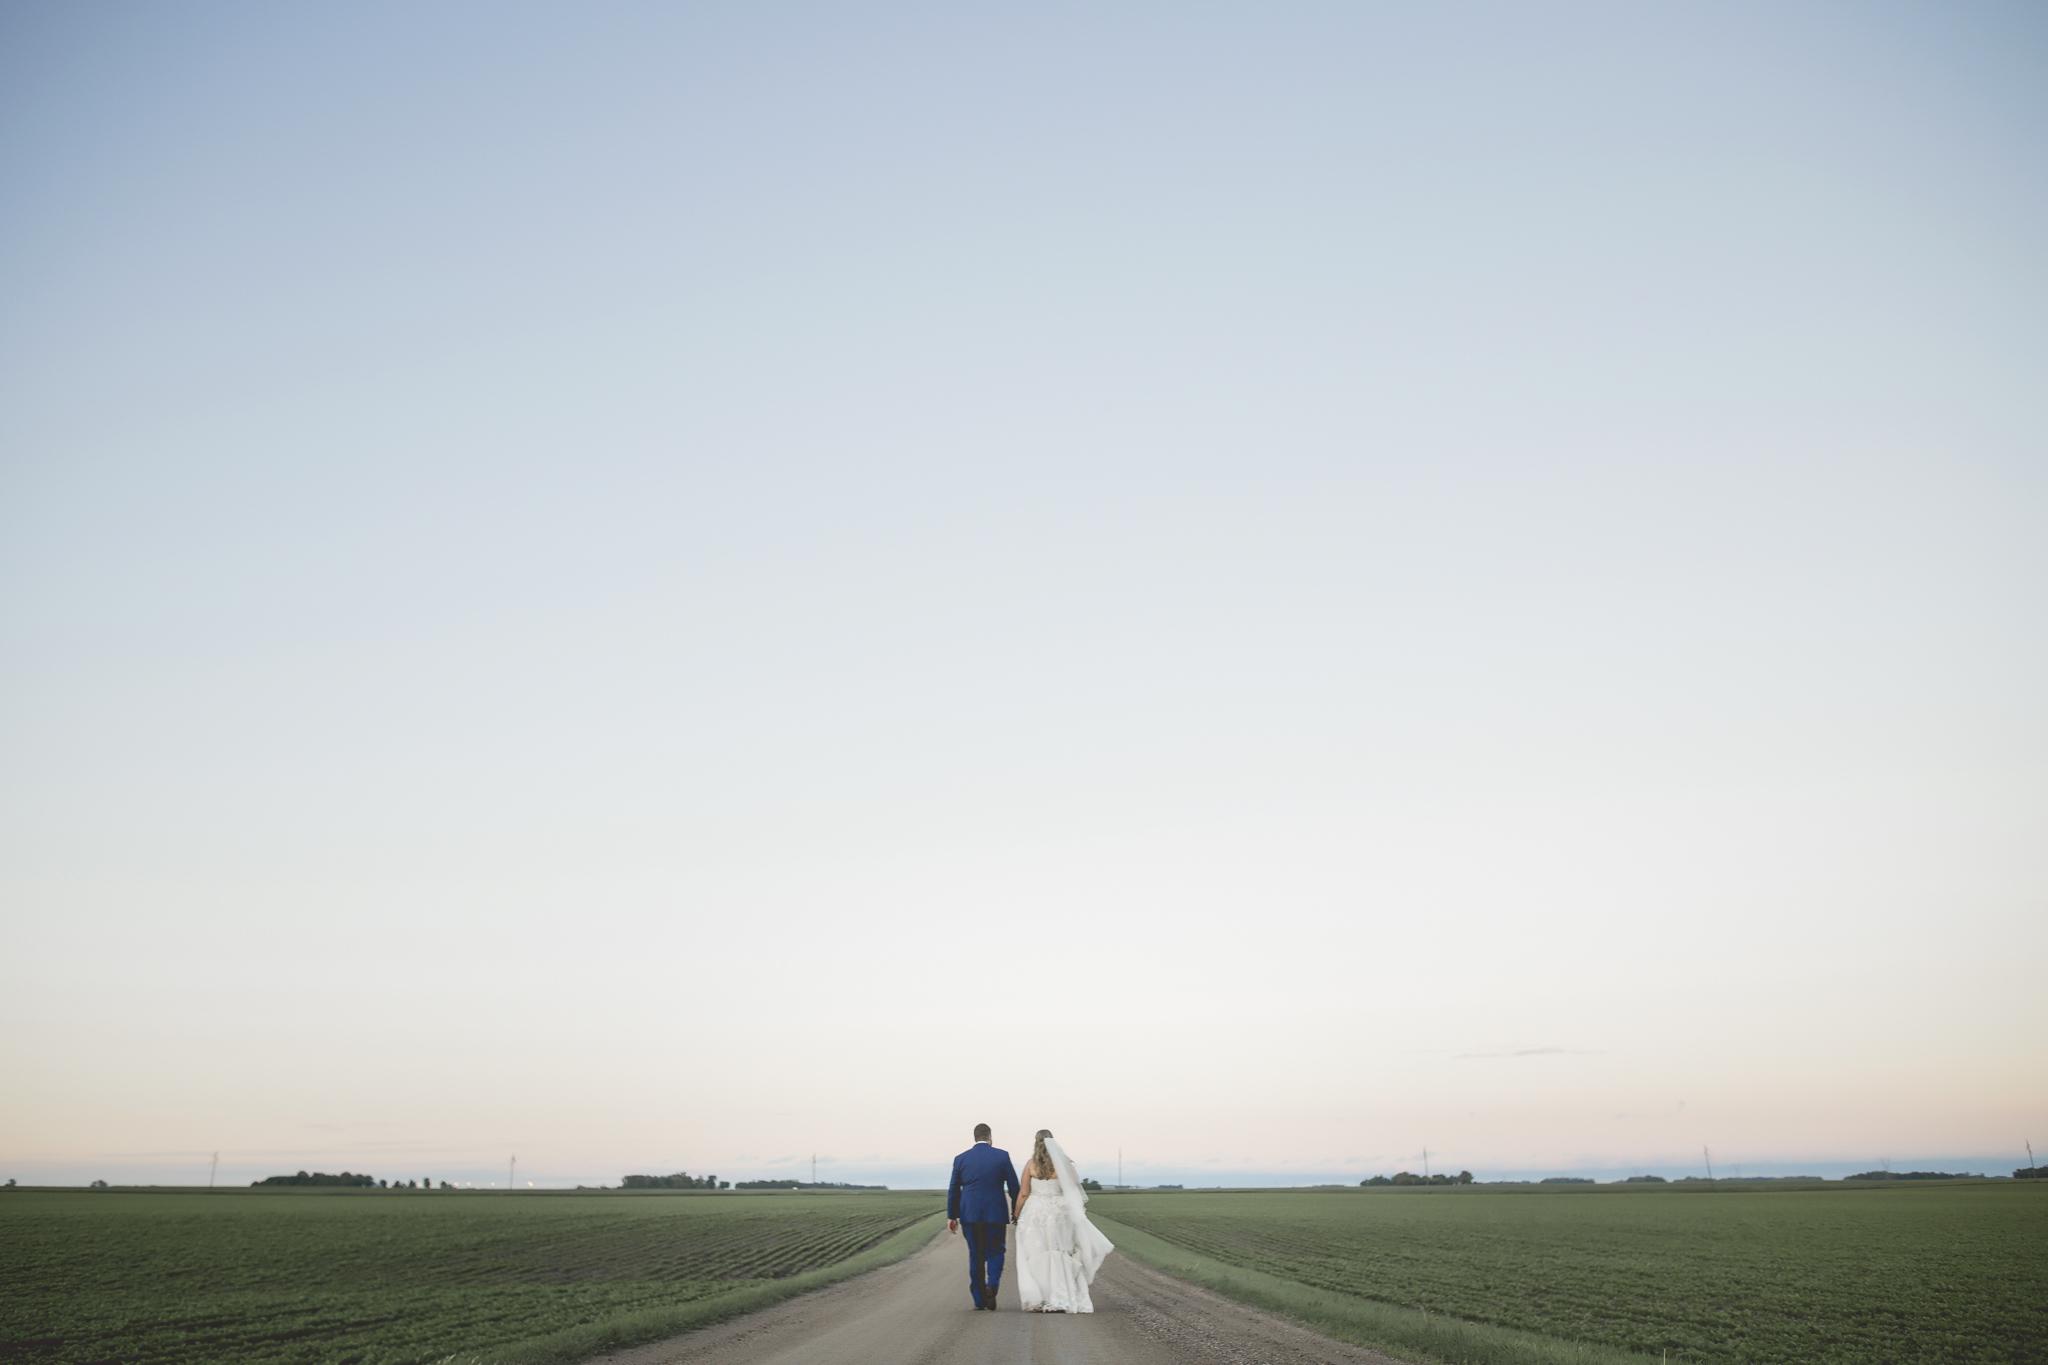 minnesota family farm outdoor wedding photographer-15.jpg